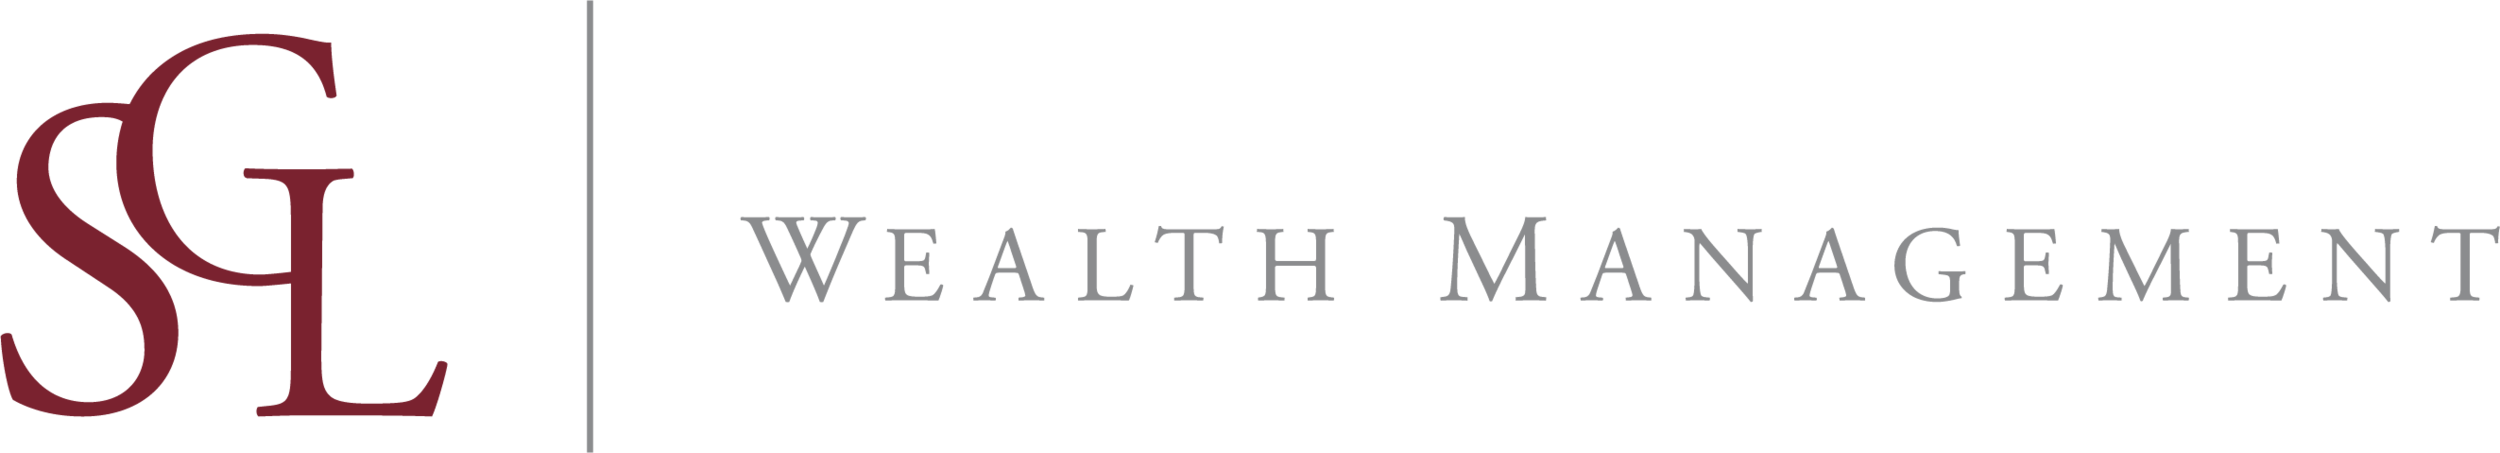 SGL-logo-horizontal-wm.png